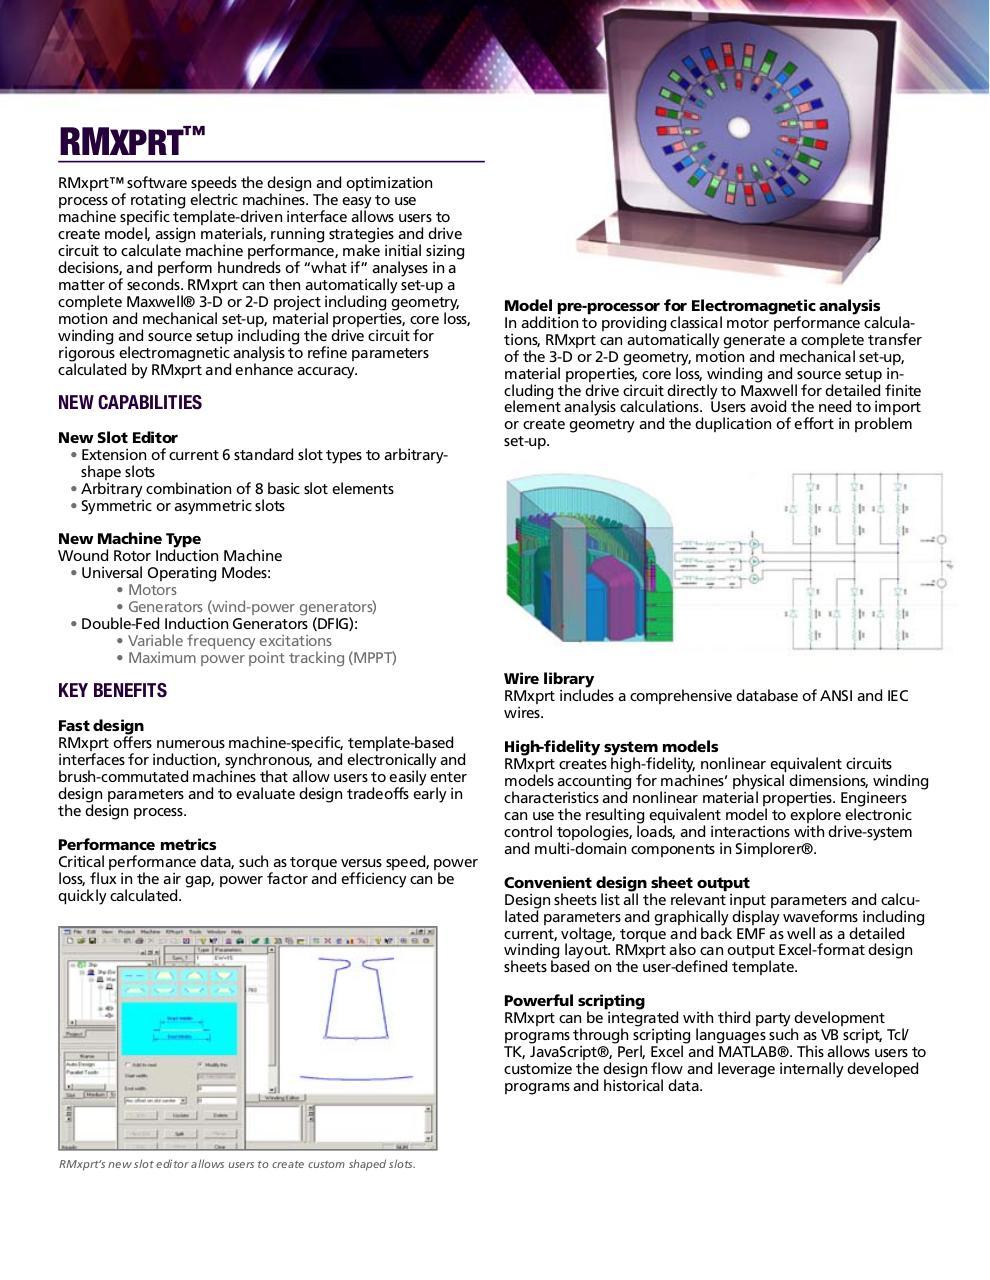 189165495 Electrical machine design using rmxprt - Fichier PDF